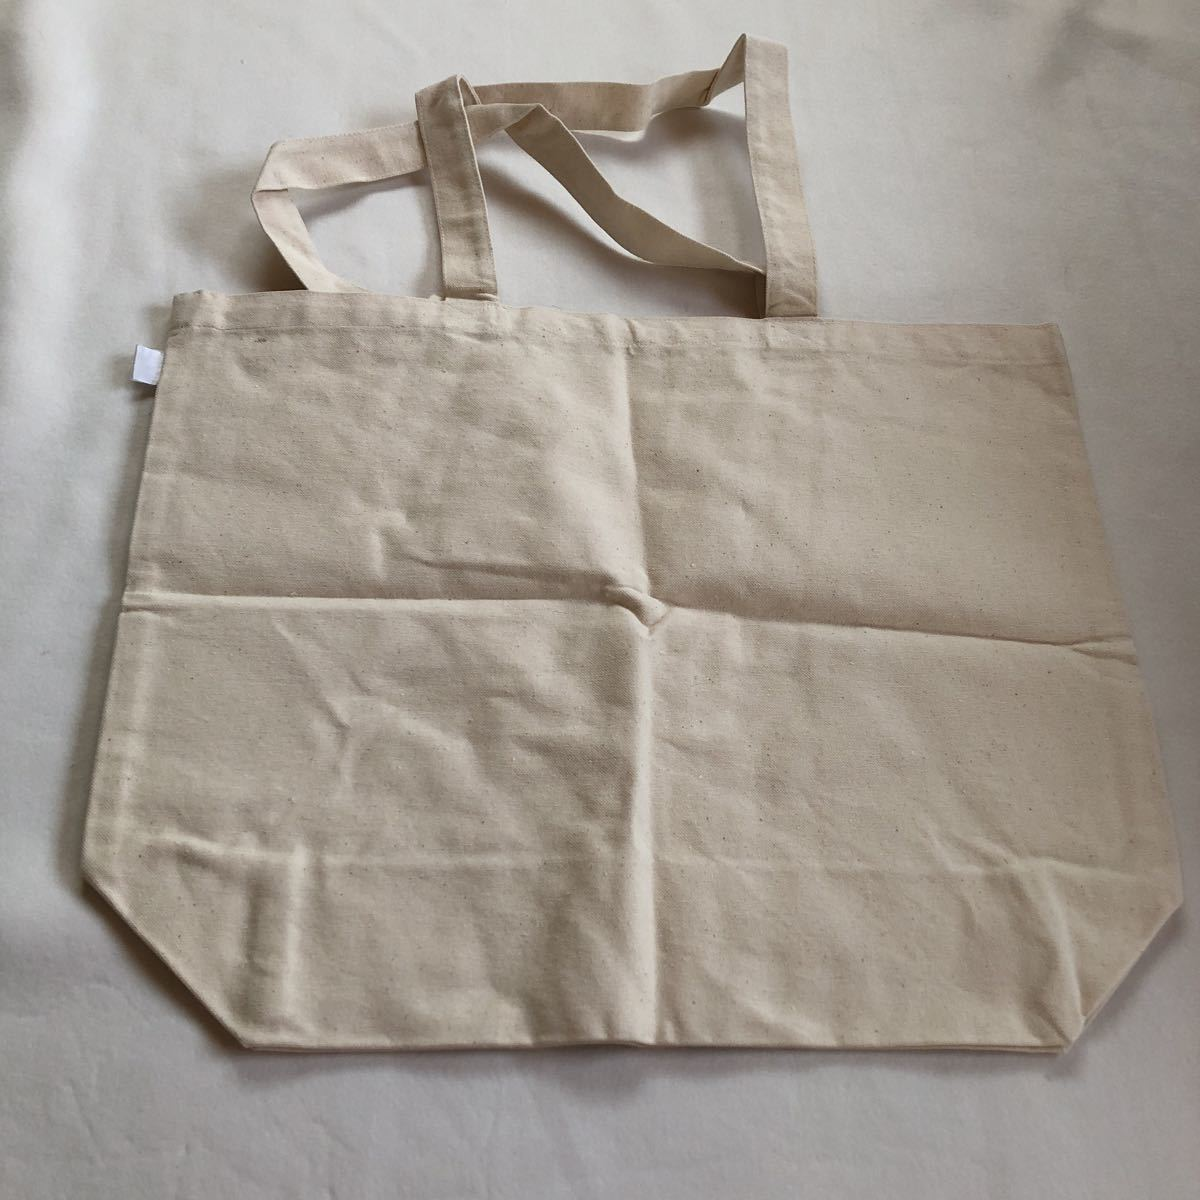 Une autre idee du fromage 鞄 かばん カバン コットンバック トートバッグ 非売品 新品 ノベルティグッズ エコバッグ_画像4